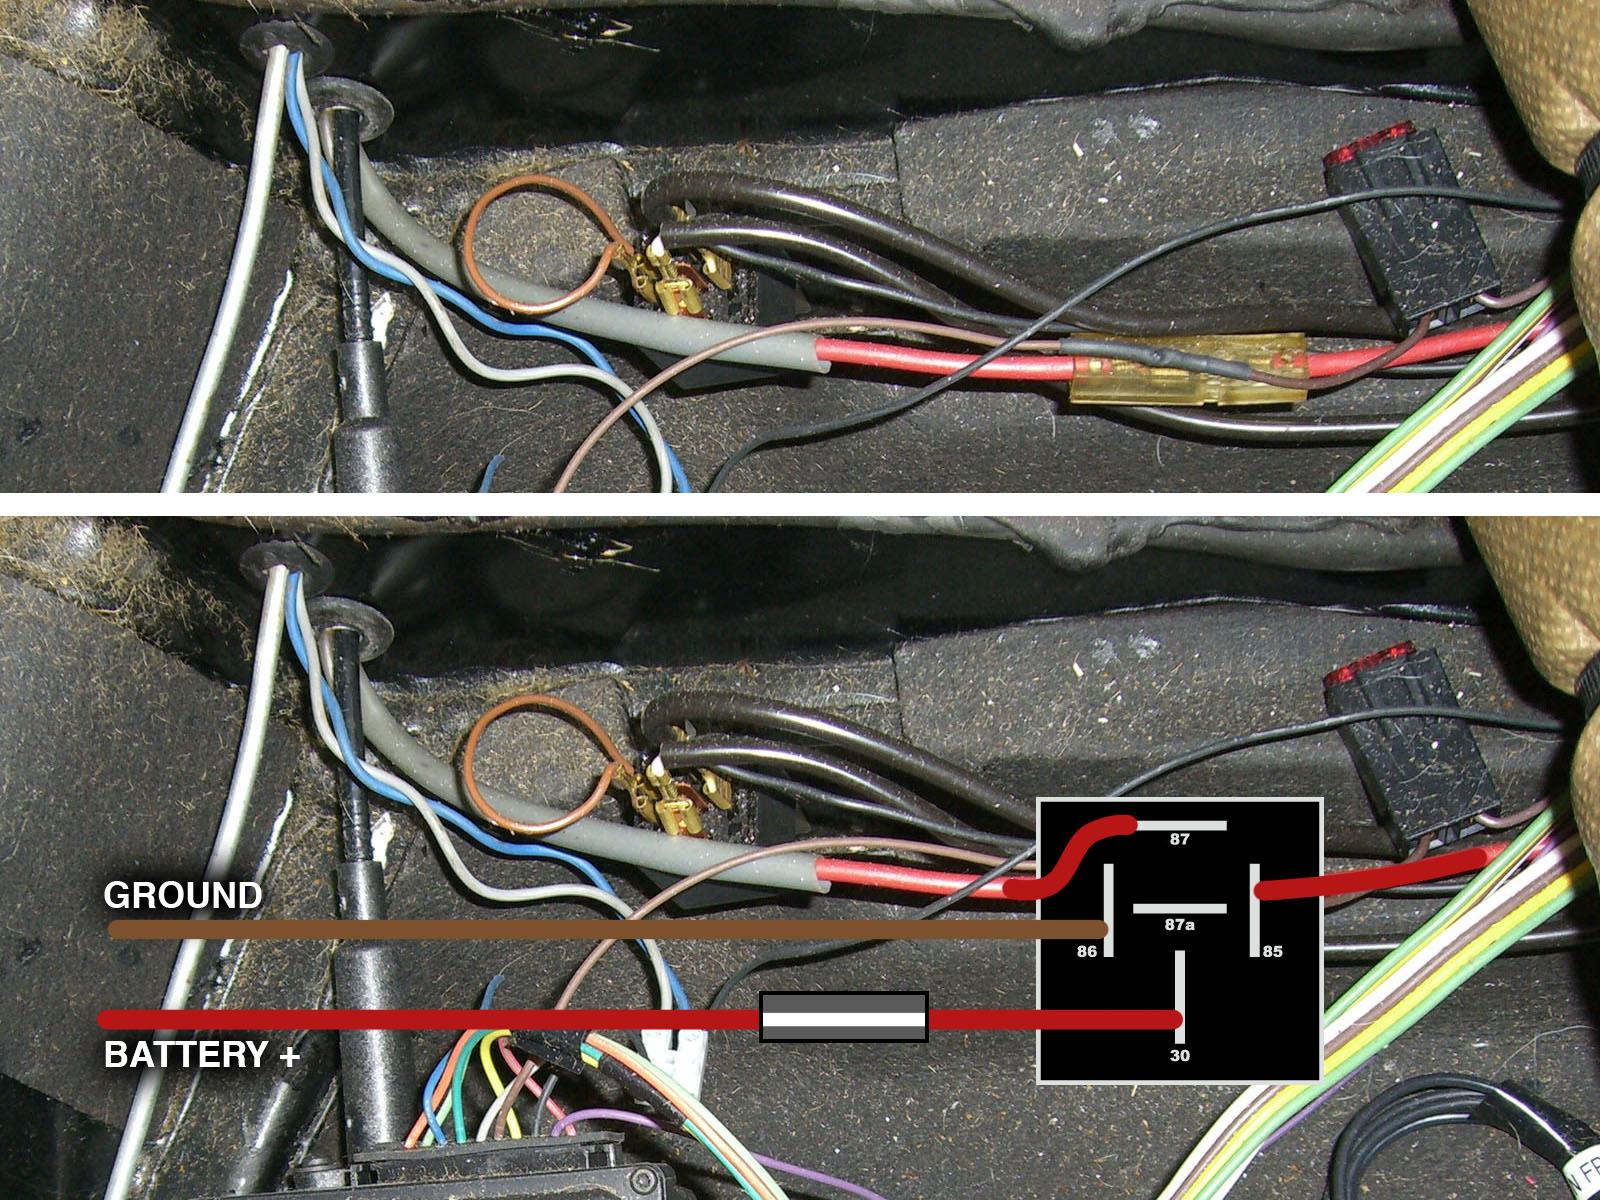 1970 vw beetle fuse box wiring diagrams mashups co 1970 Vw Beetle Fuse Box 1970 vw bug ignition wiring diagram wiring diagram 1970 vw beetle fuse box 1970 vw bug 1970 vw beetle fuse box